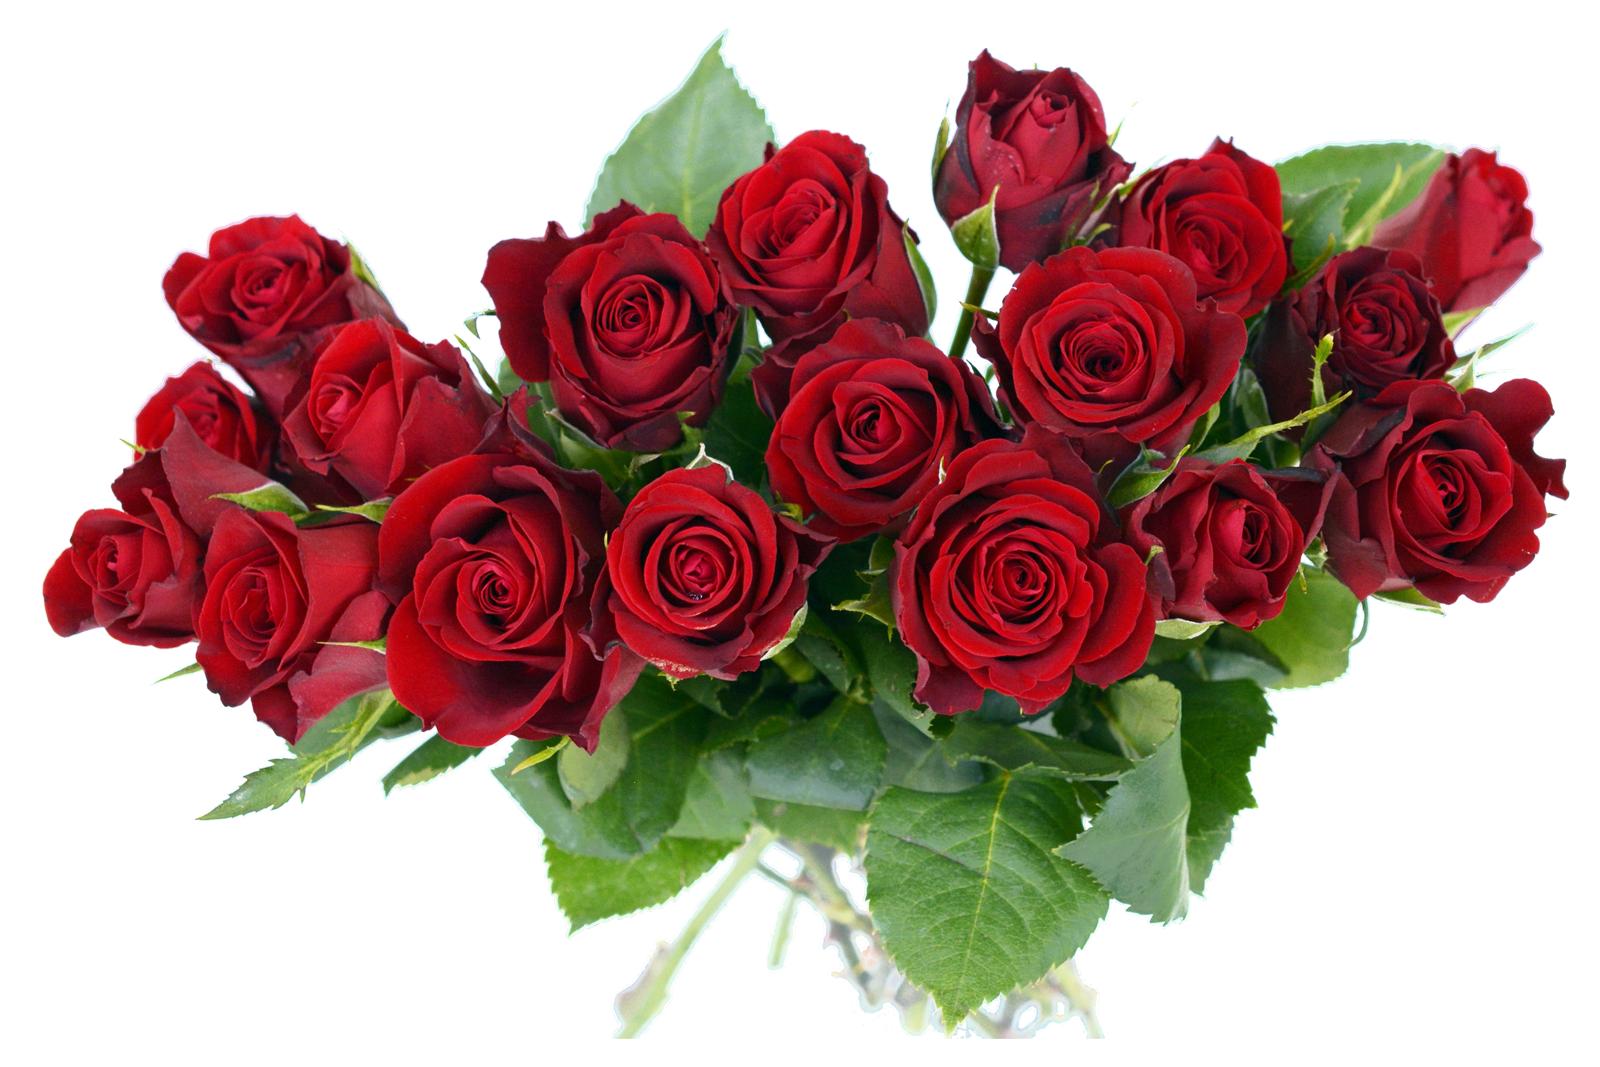 Rose bouquet png image purepng free transparent cc0 png image rose bouquet izmirmasajfo